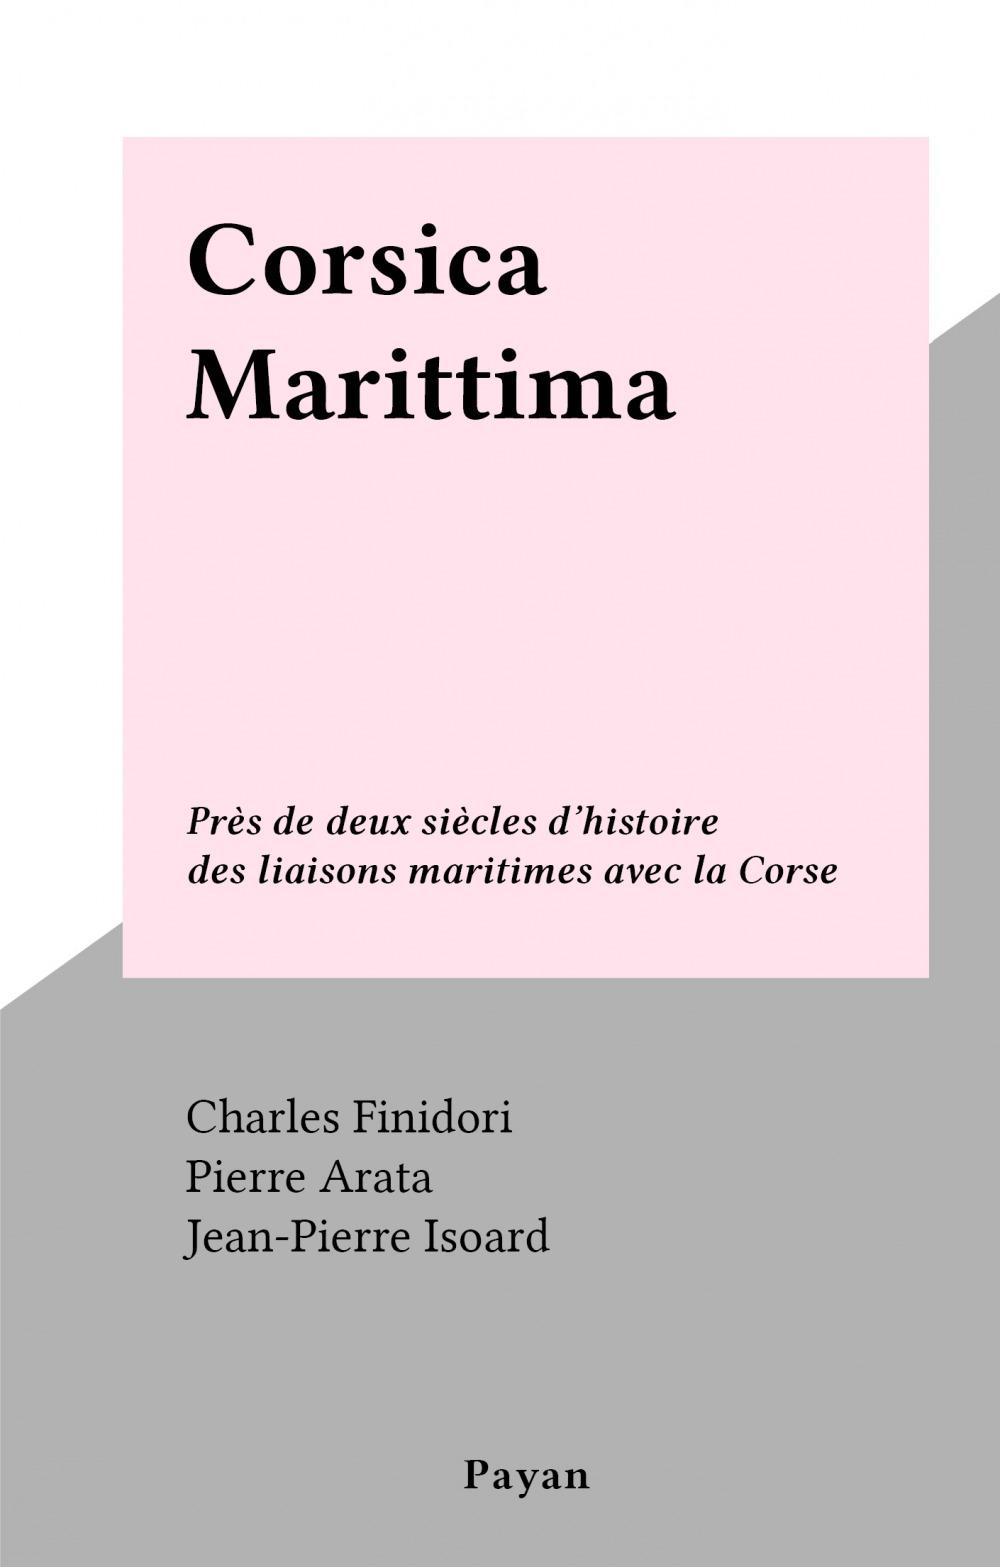 Corsica Marittima  - Charles Finidori